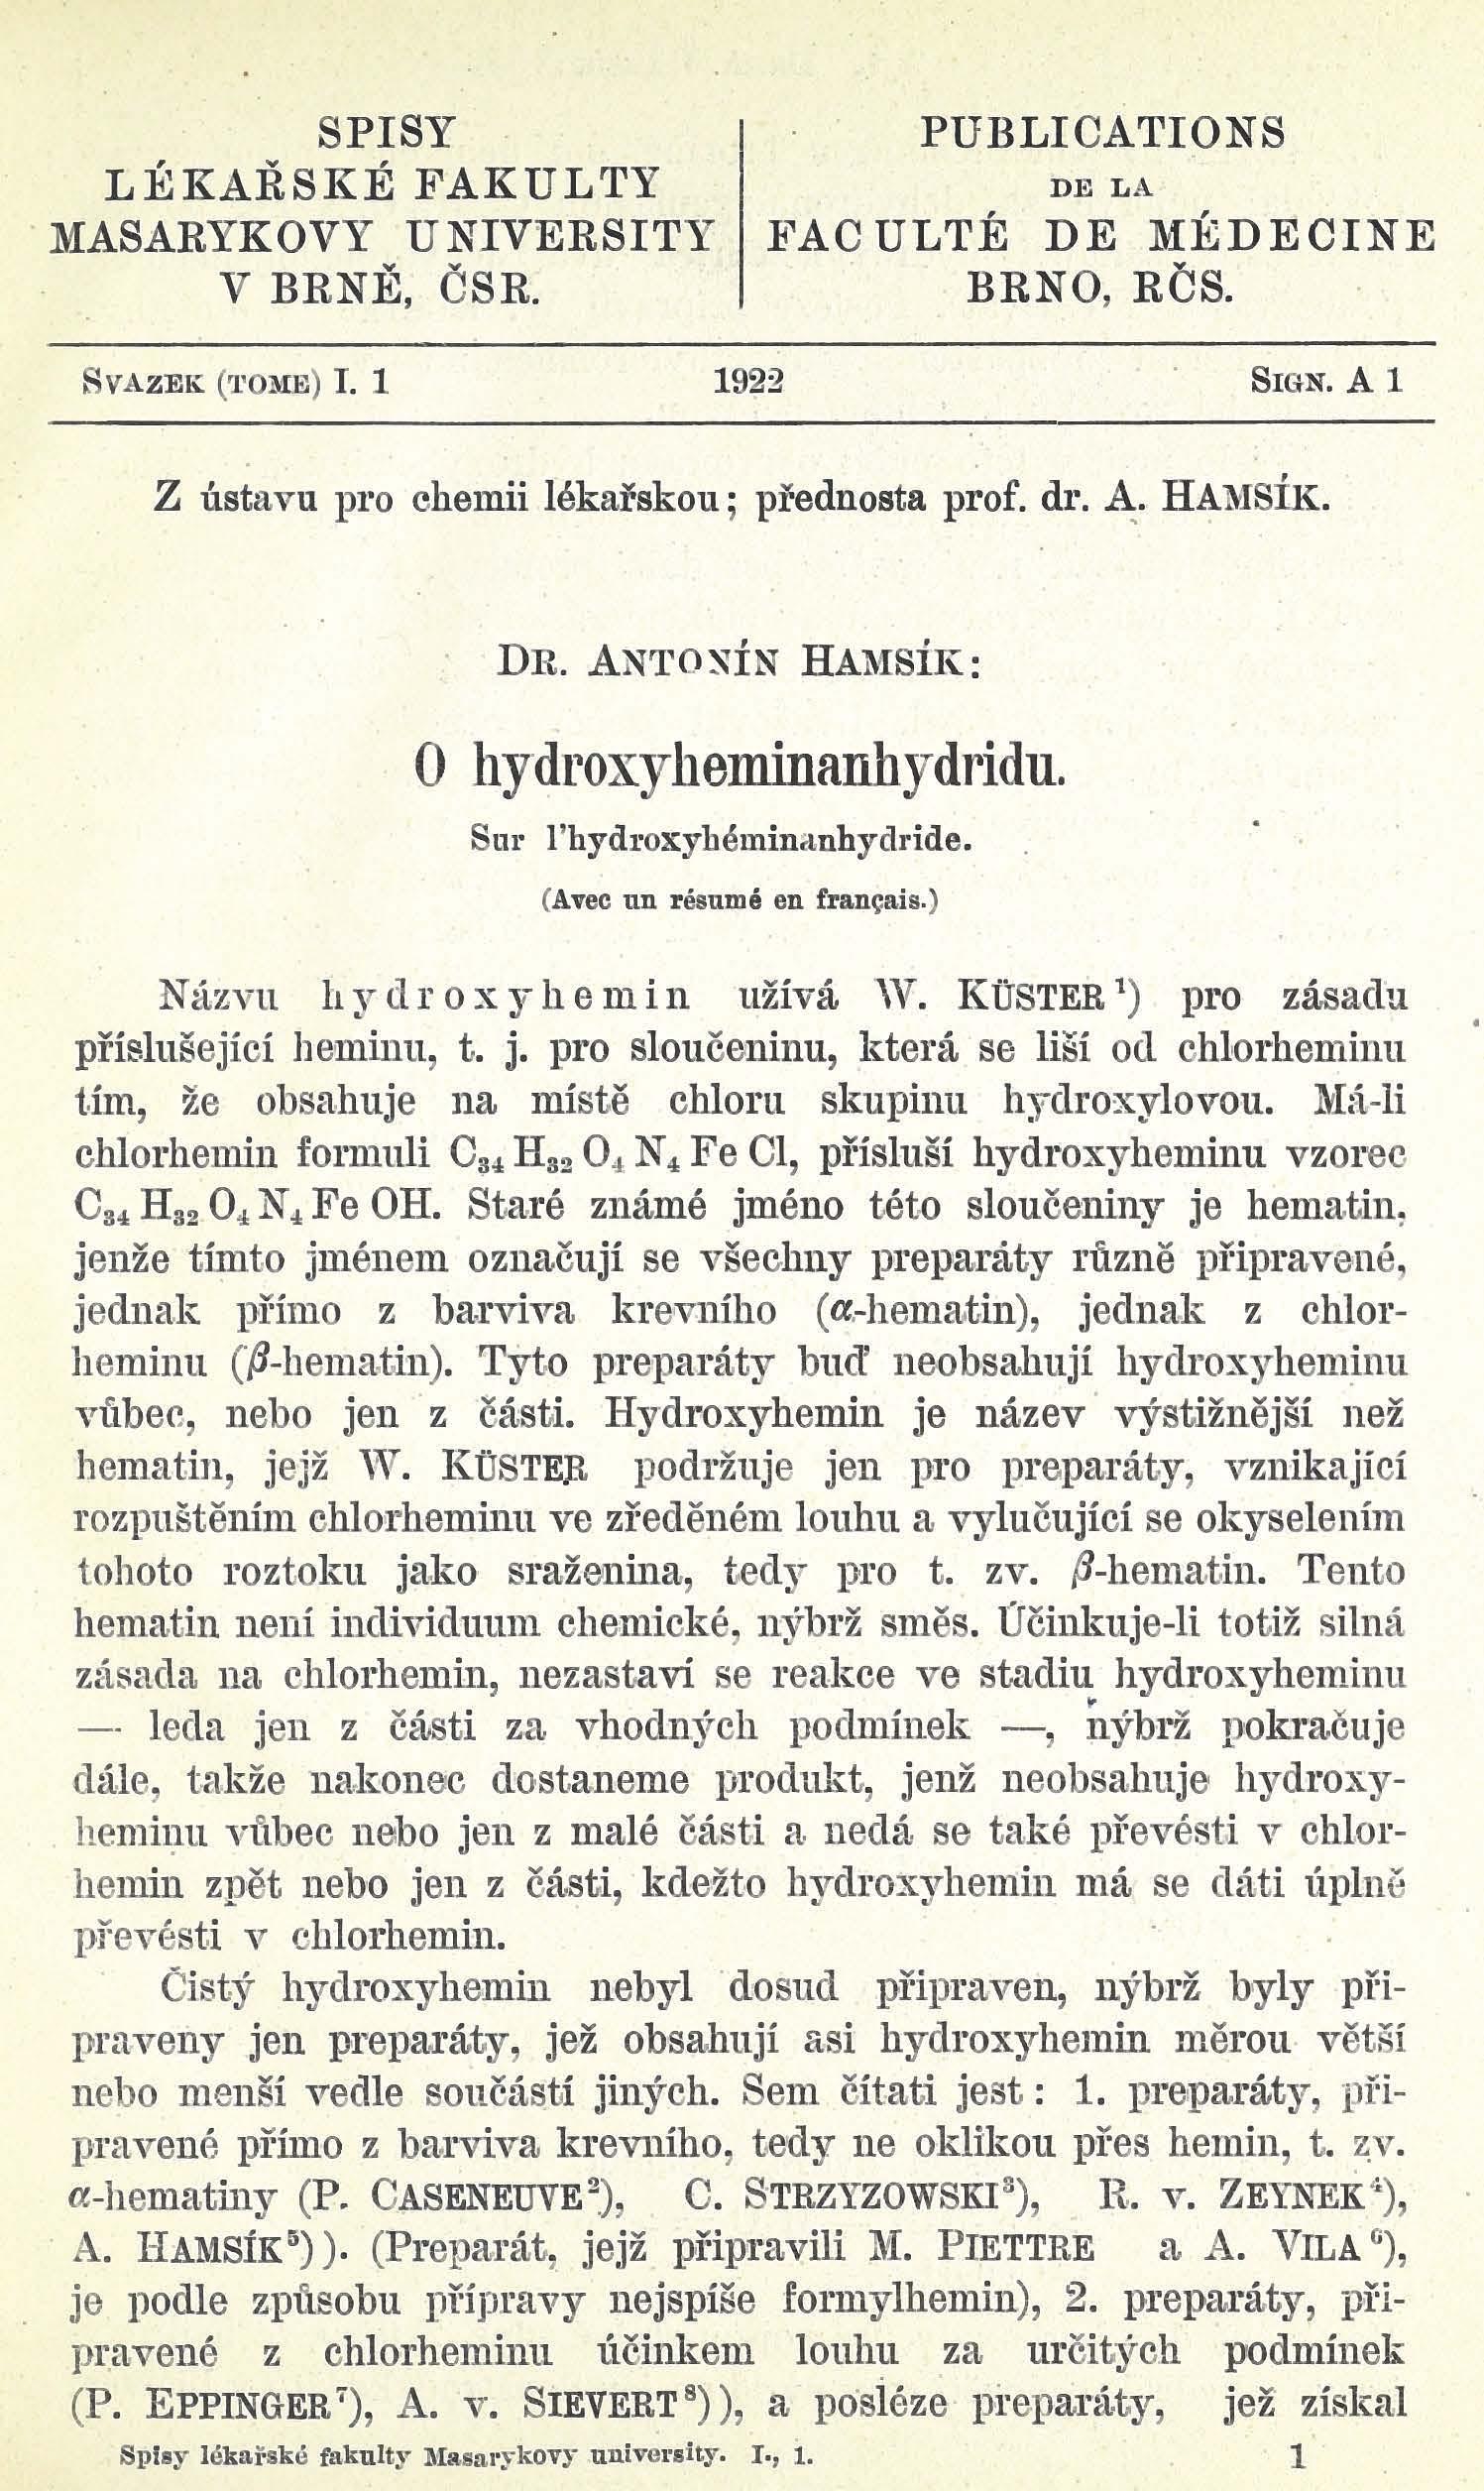 Obálka pro O hydroxyheminanhydridu / Sur l'hydroxyheminanhydride